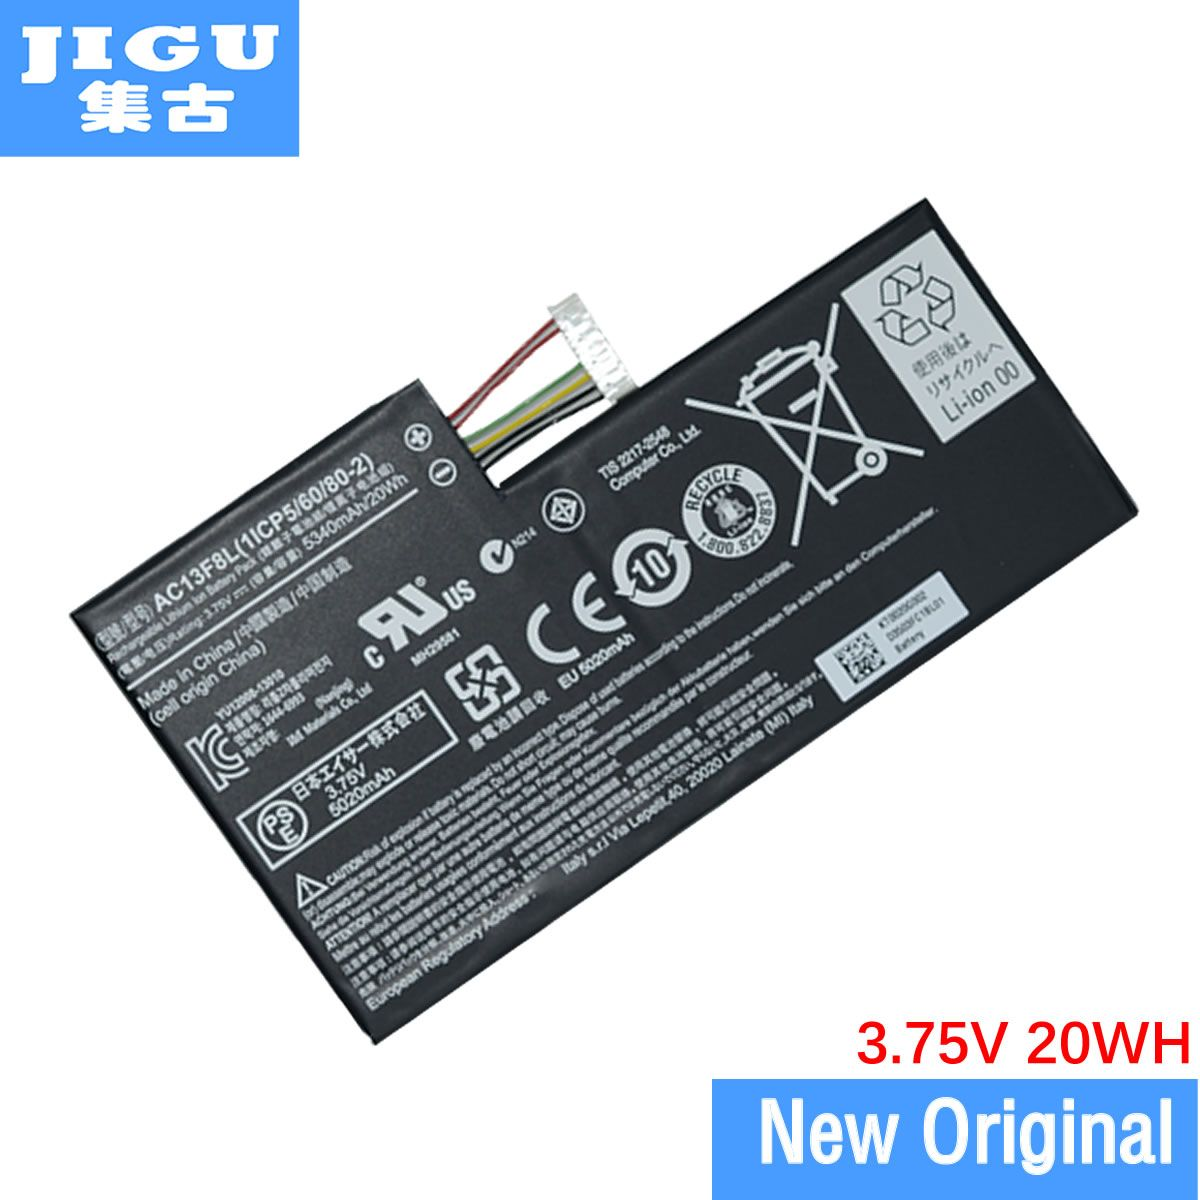 JIGU 1ICP5/60/80-2 AC13F8L Batterie FÜR Acer Iconia Tab A1-810 A1-811 W4-820 W4-820p 1CP5/ 60/80-2 AC13F3L LAptop Tablet PC